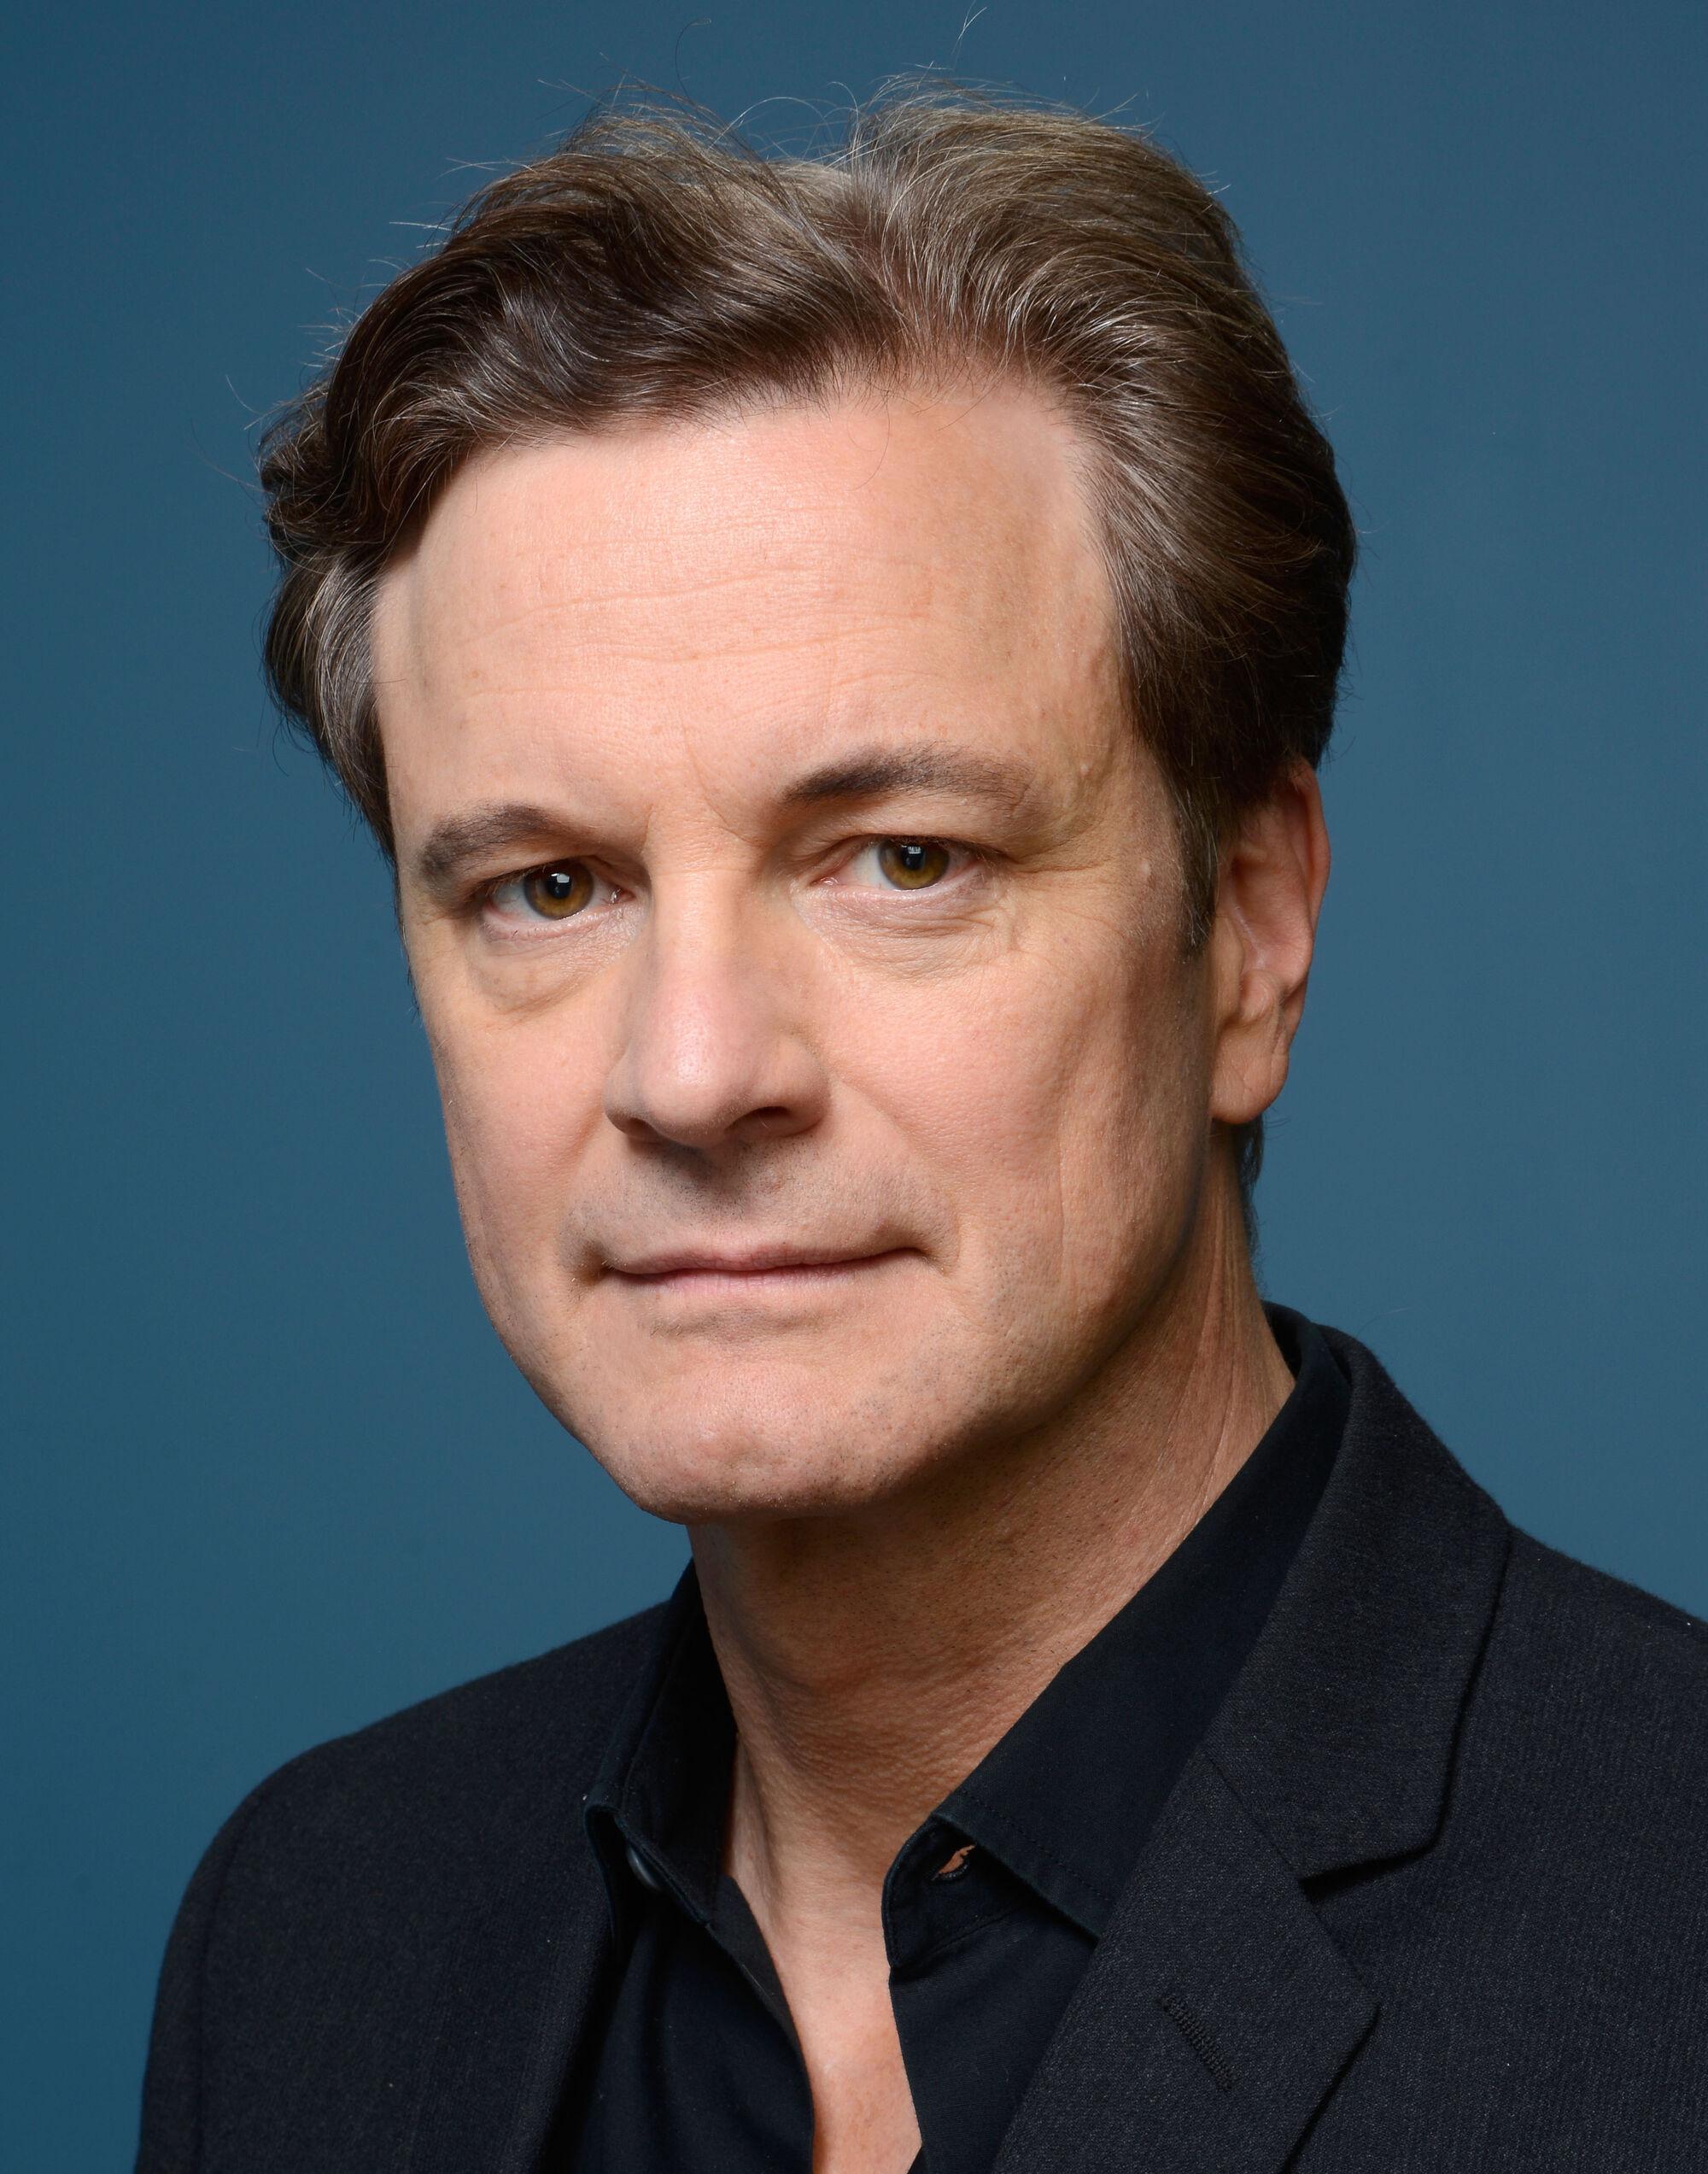 Watch Colin Firth (born 1960) video